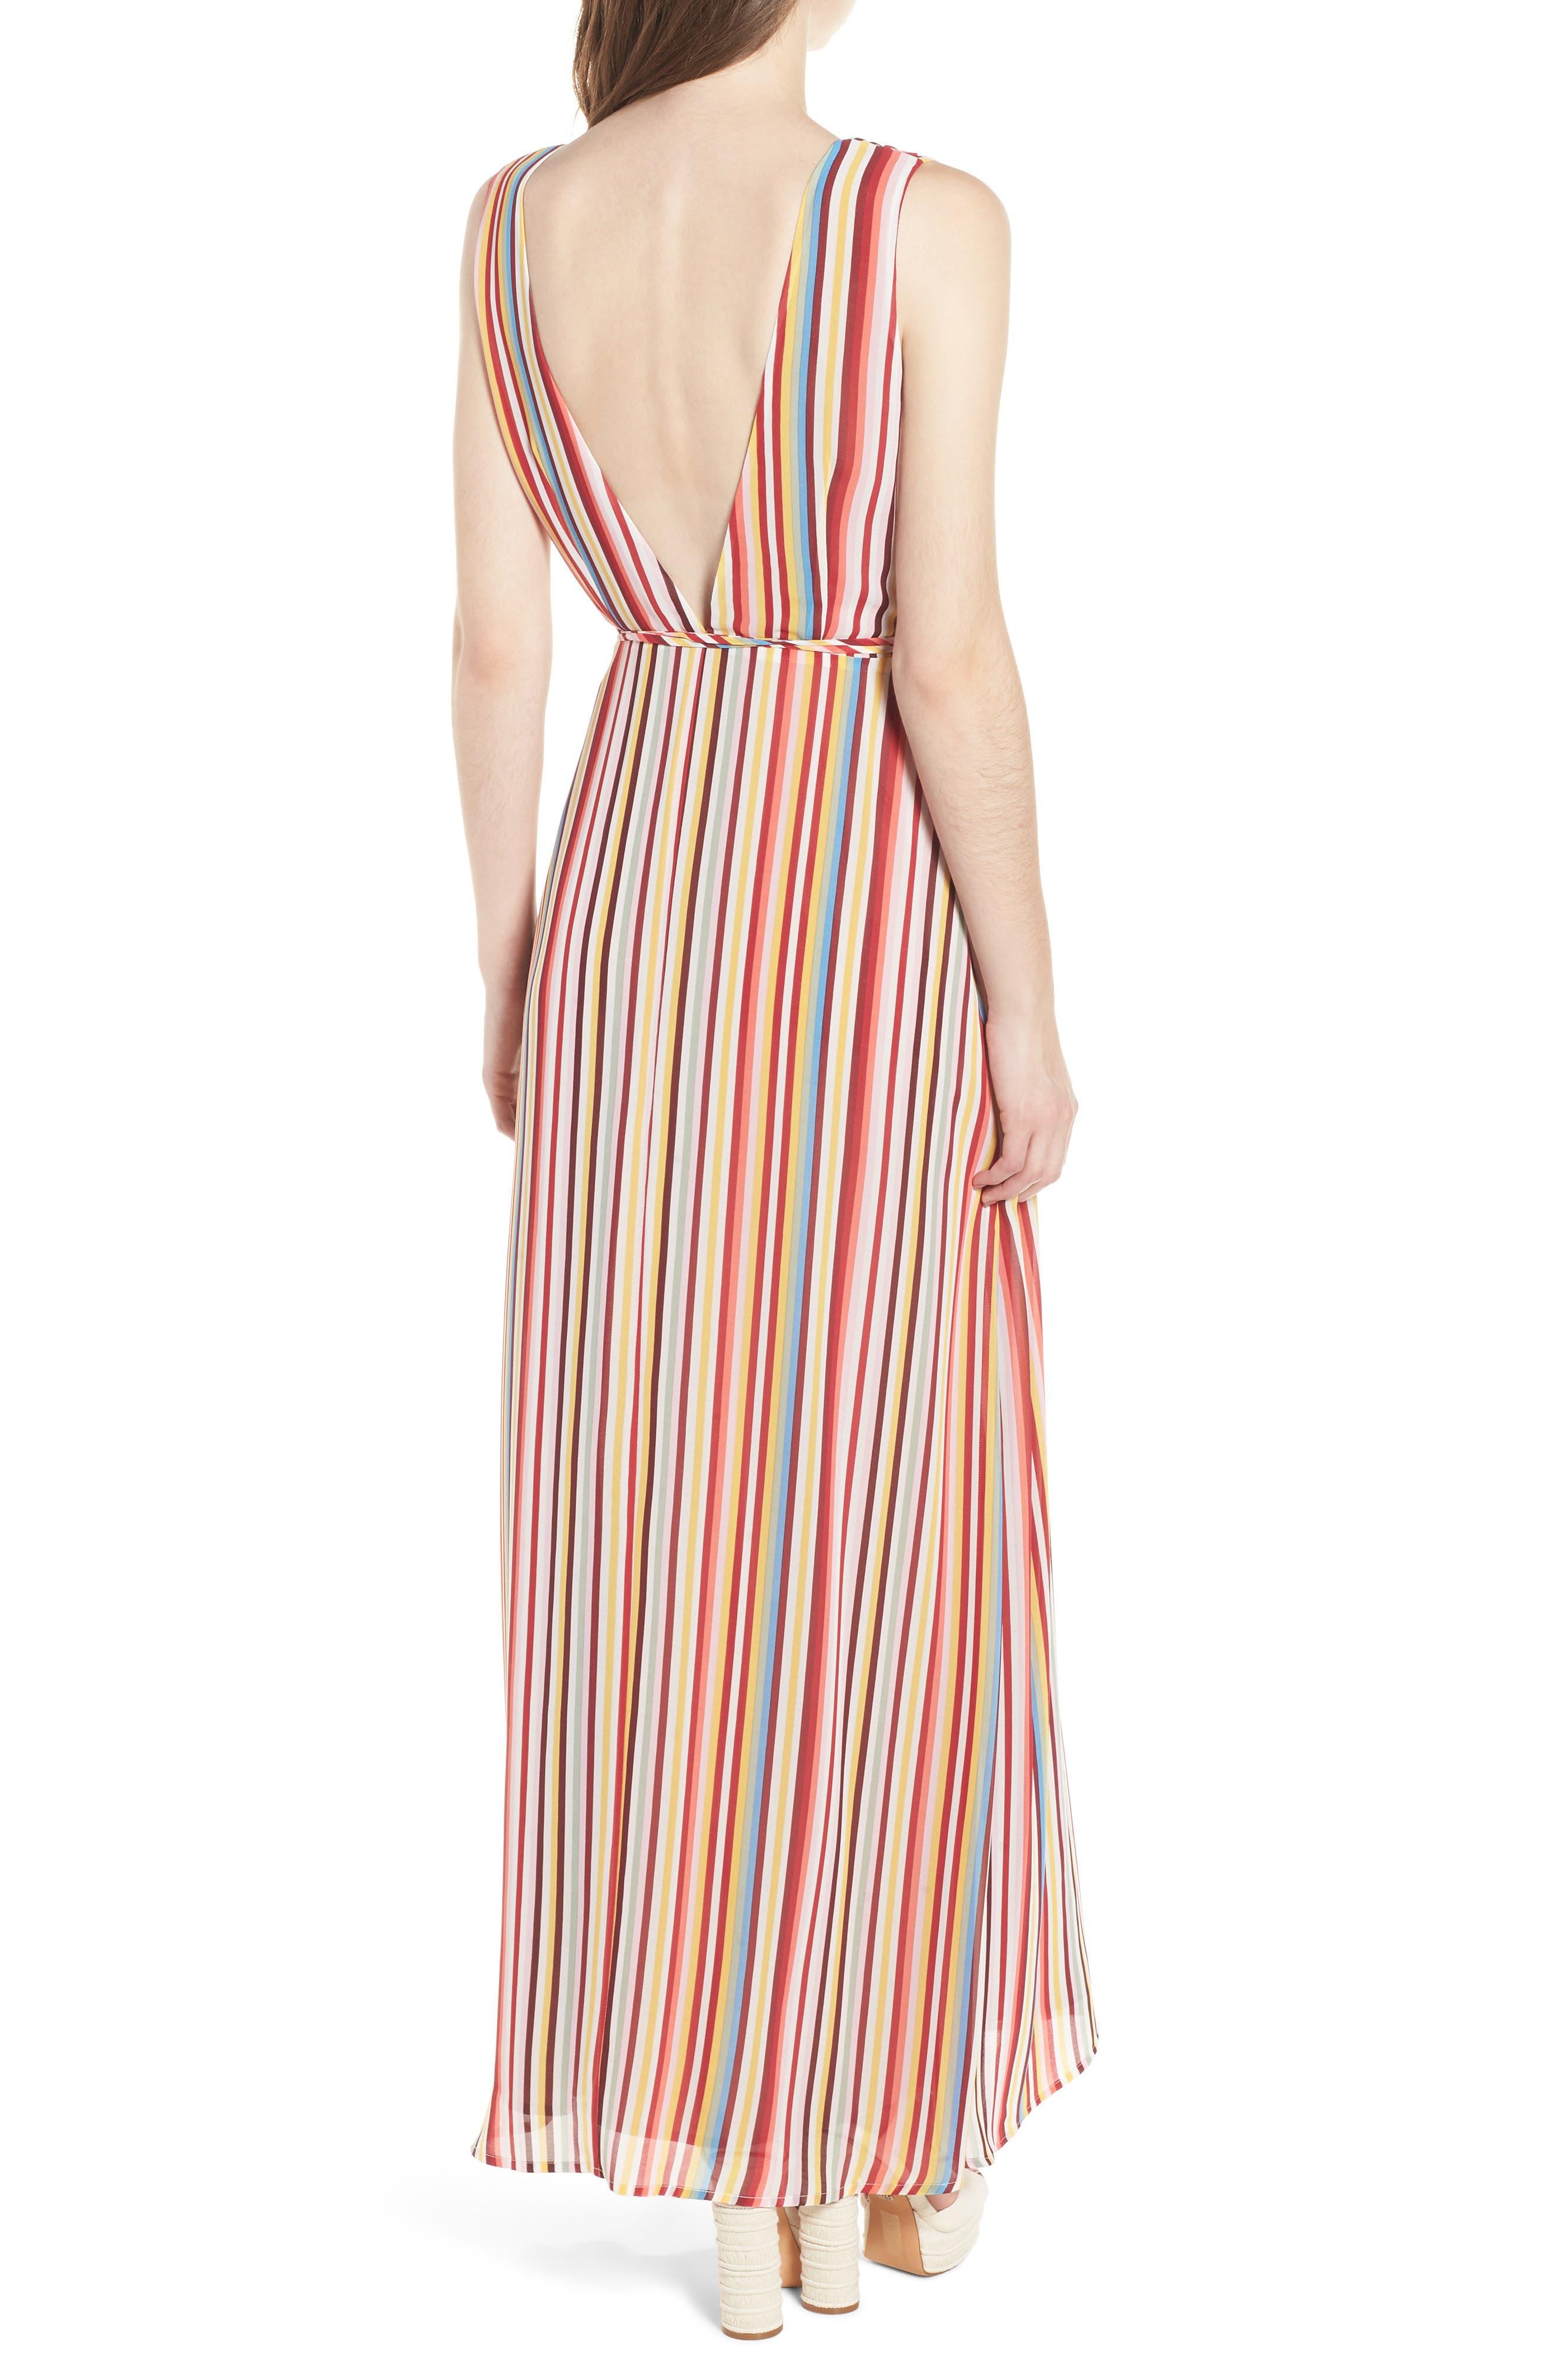 Bobby Wrap Maxi Dress,                             Alternate thumbnail 2, color,                             Red Multi Stripe